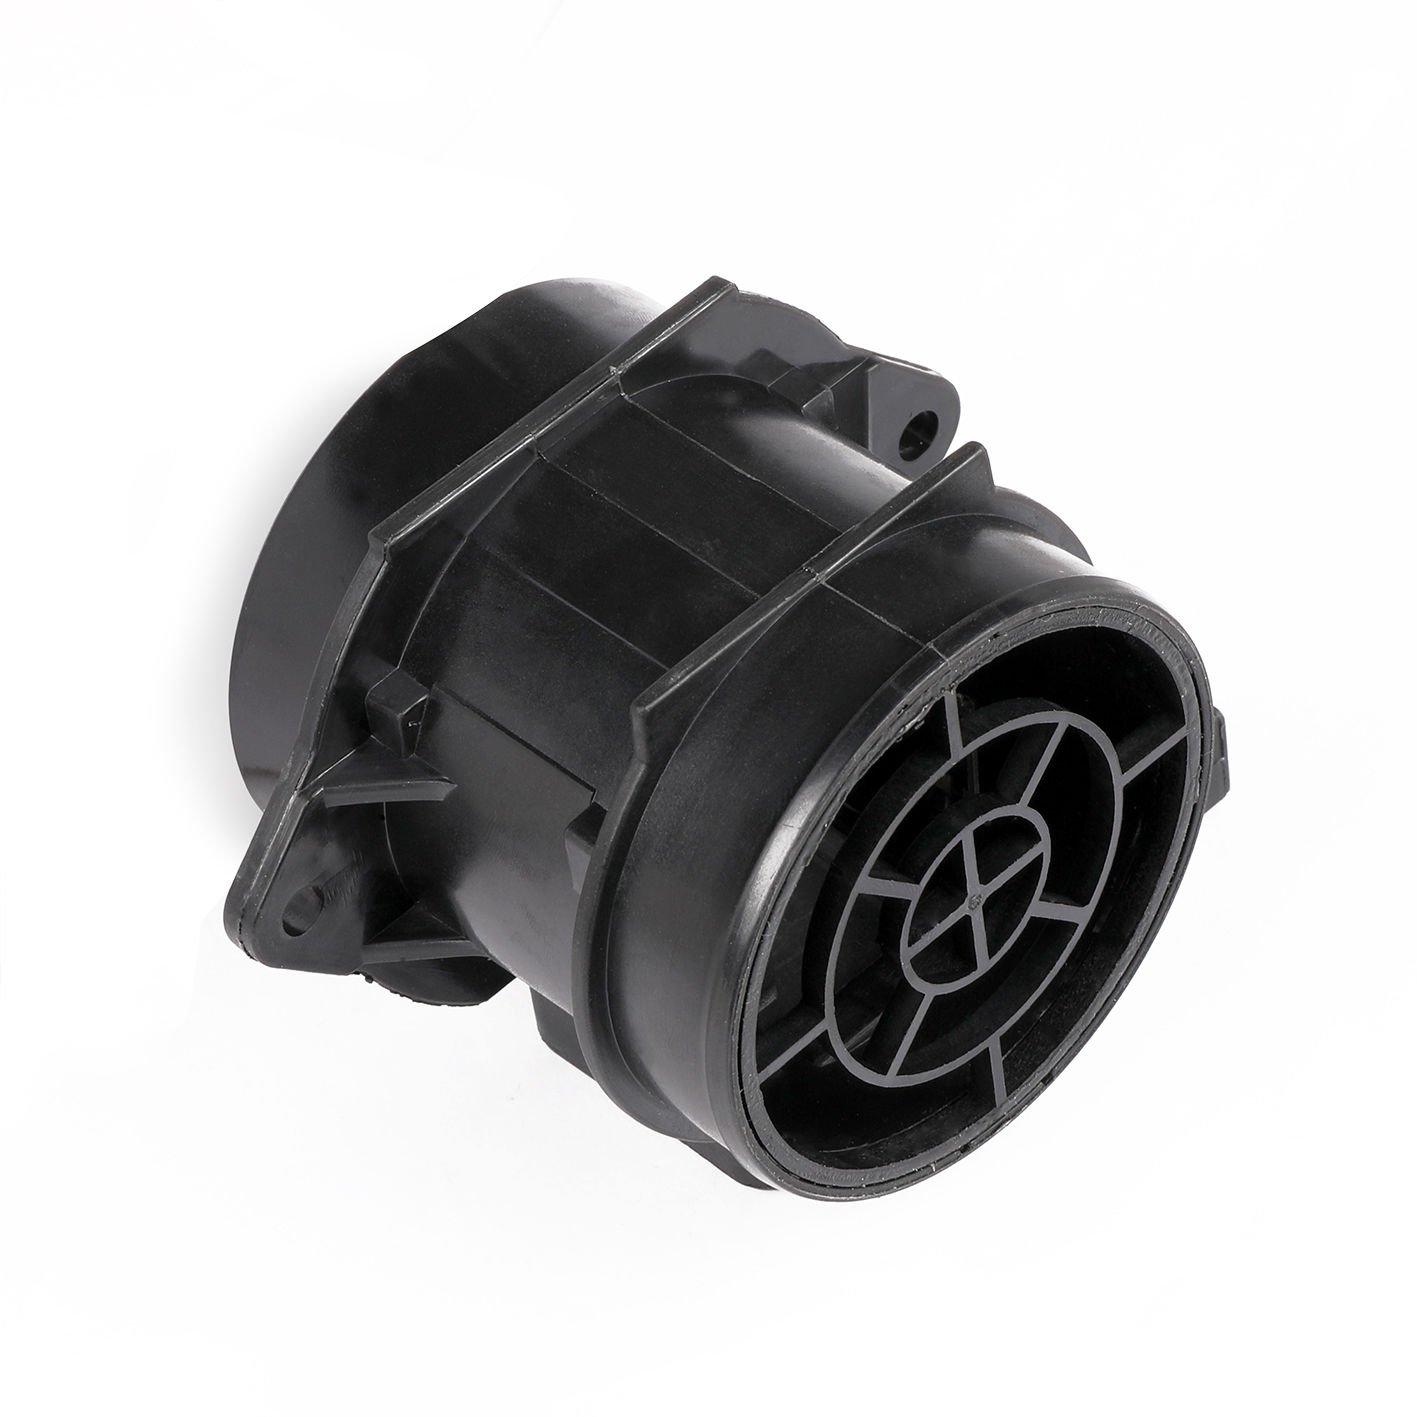 Mass Air Flow Sensor MAF for Hyundai Elantra Kia Optima Rio6 Spectra Sportage